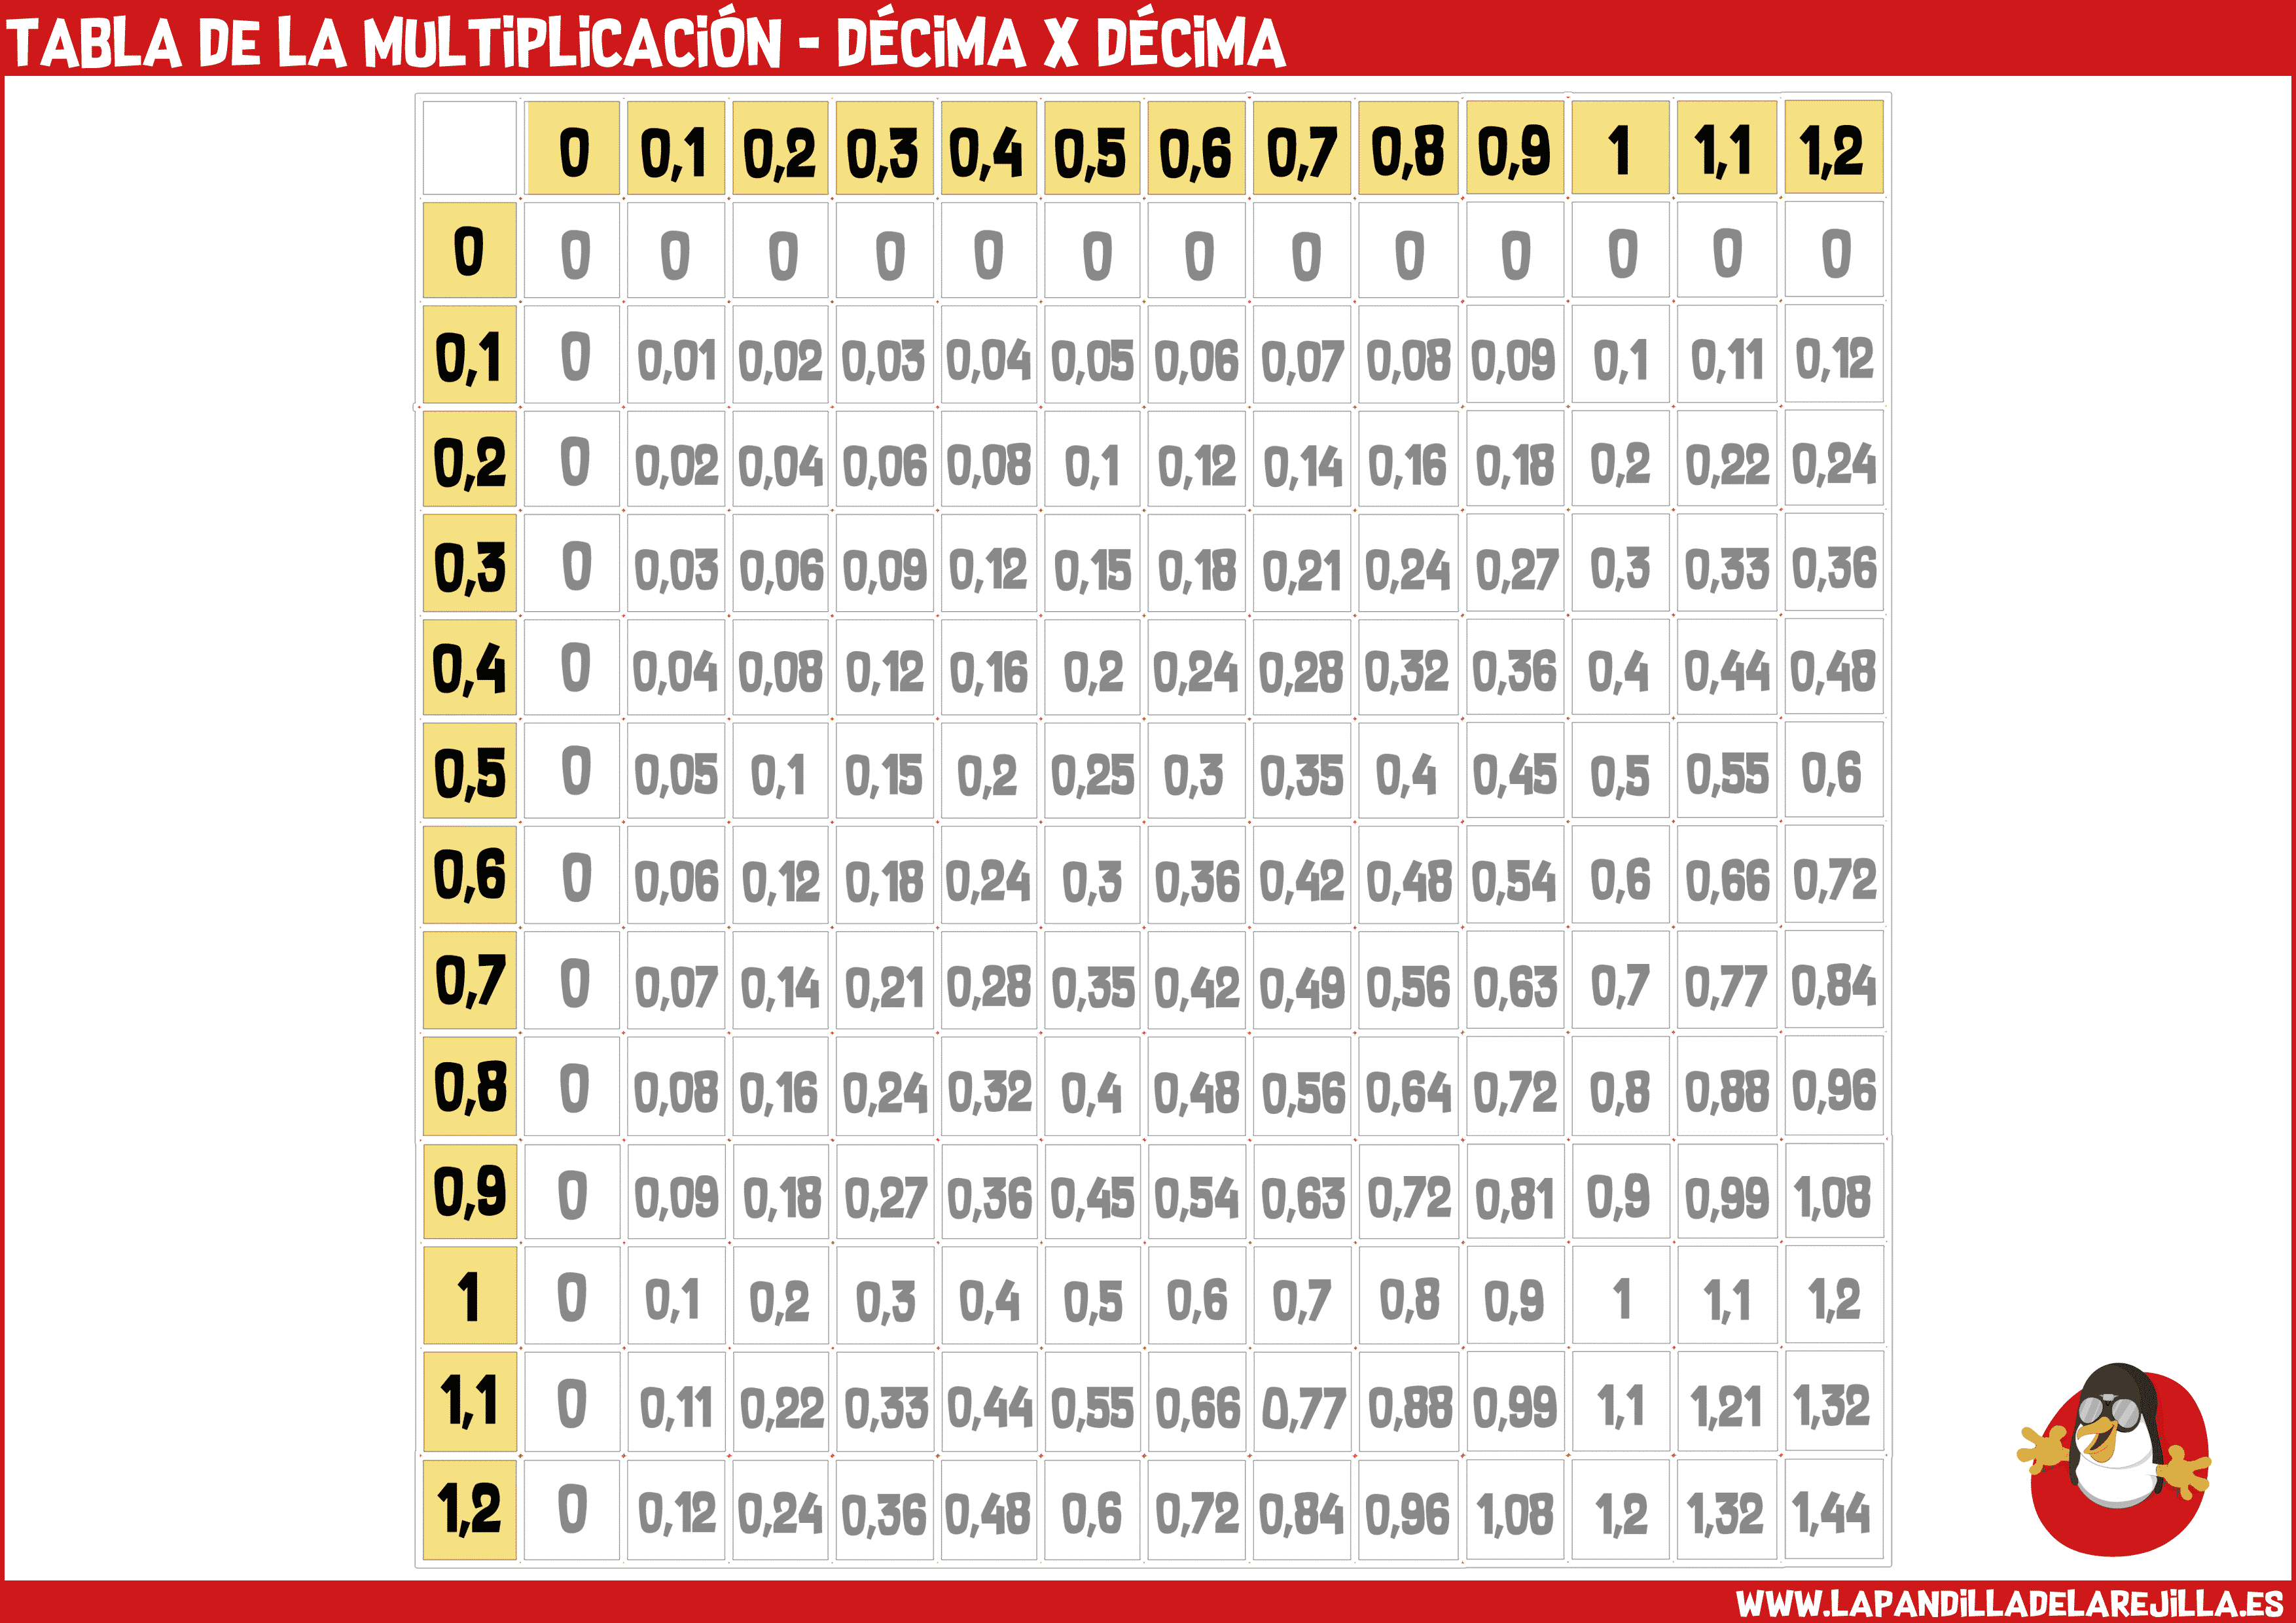 Tabla de la Multiplicacion - Decima x Decima